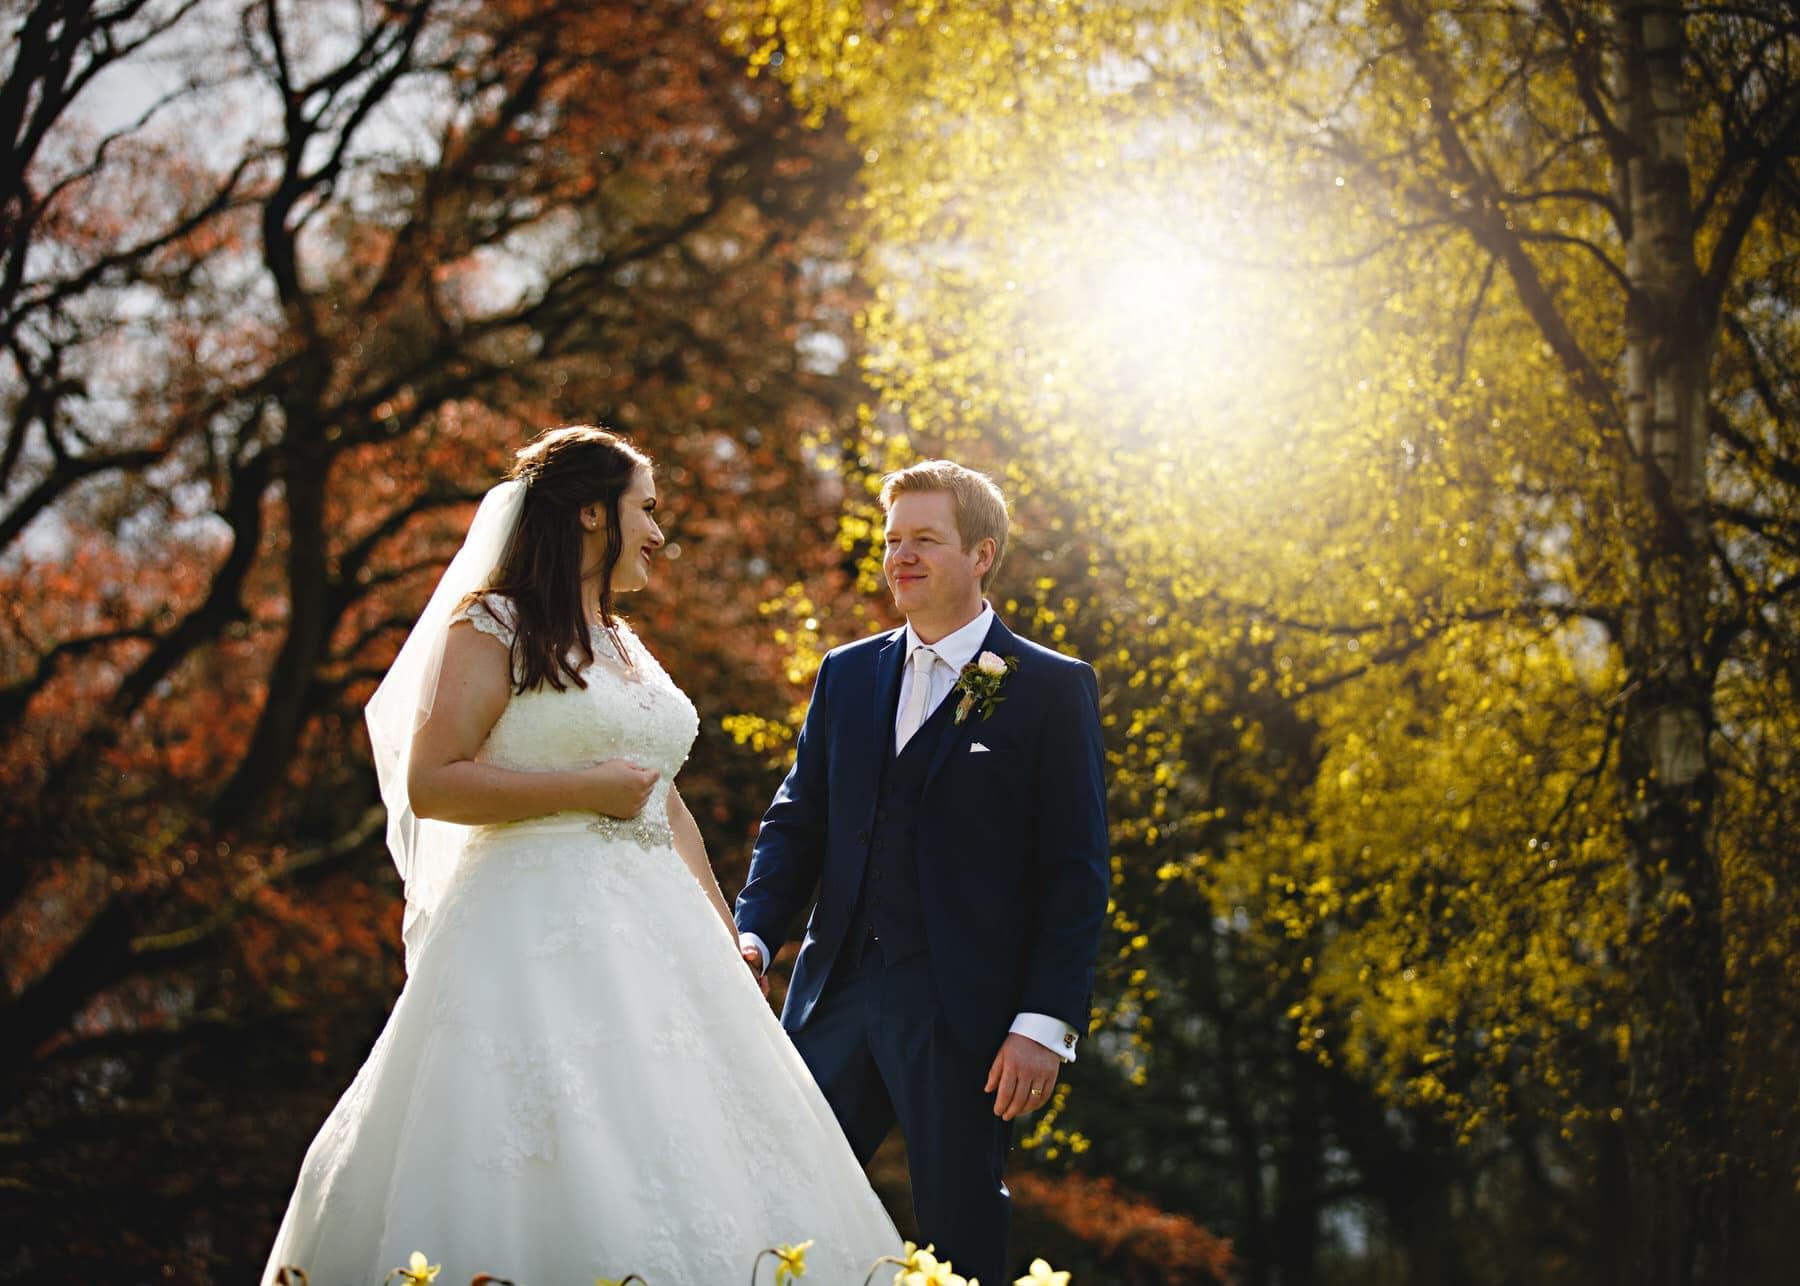 bride and groom in the autumn sun Osmaston Park in Derbyshire